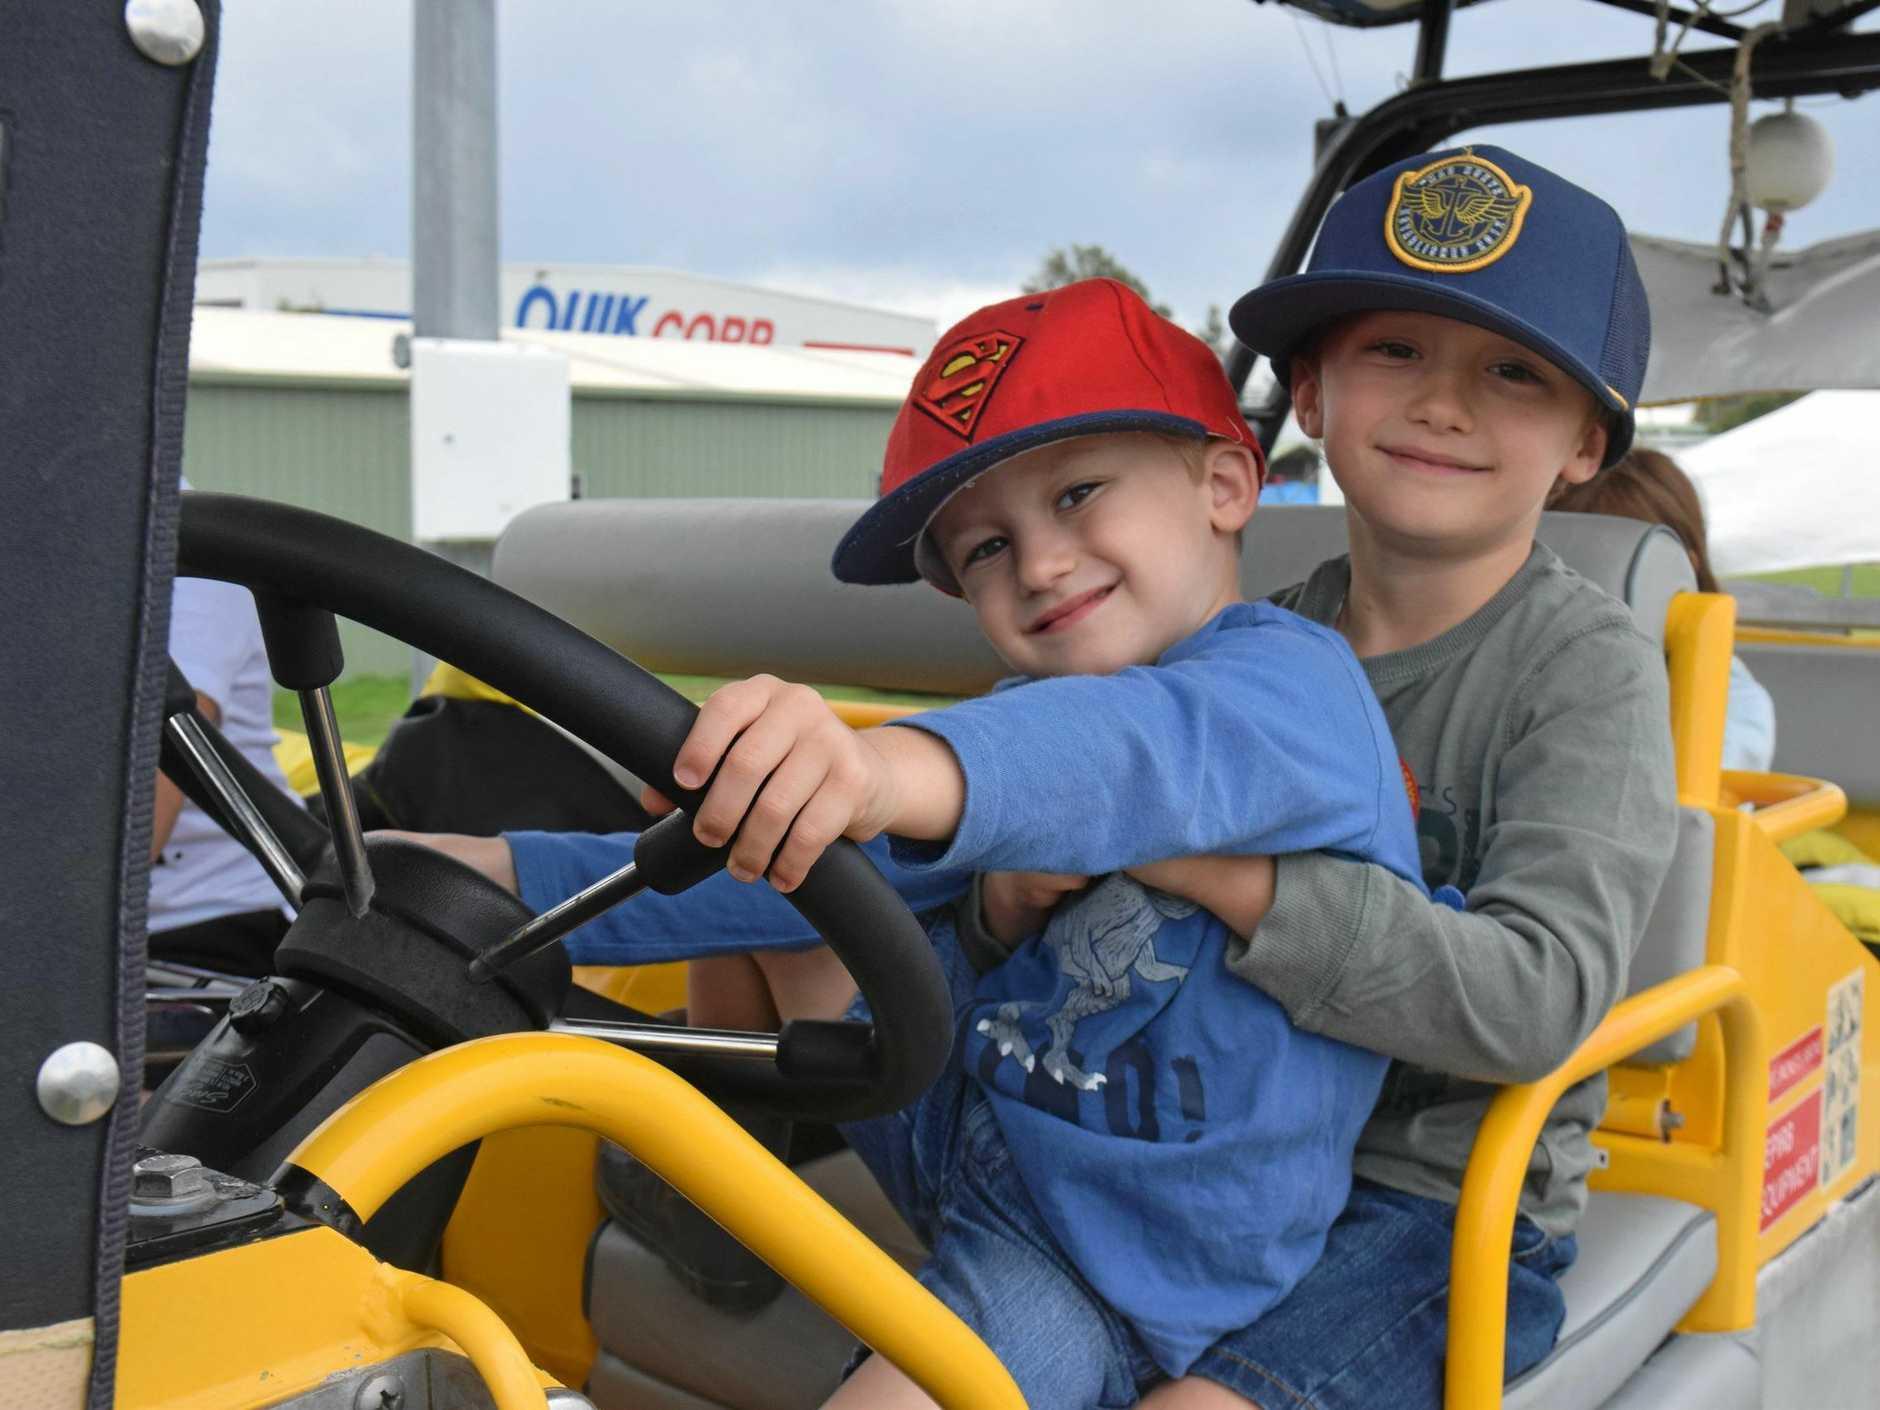 FUN DAY: Nixon and Cruz Whittle at the Emergency Services Expo at Sunshine Coast Stadium.